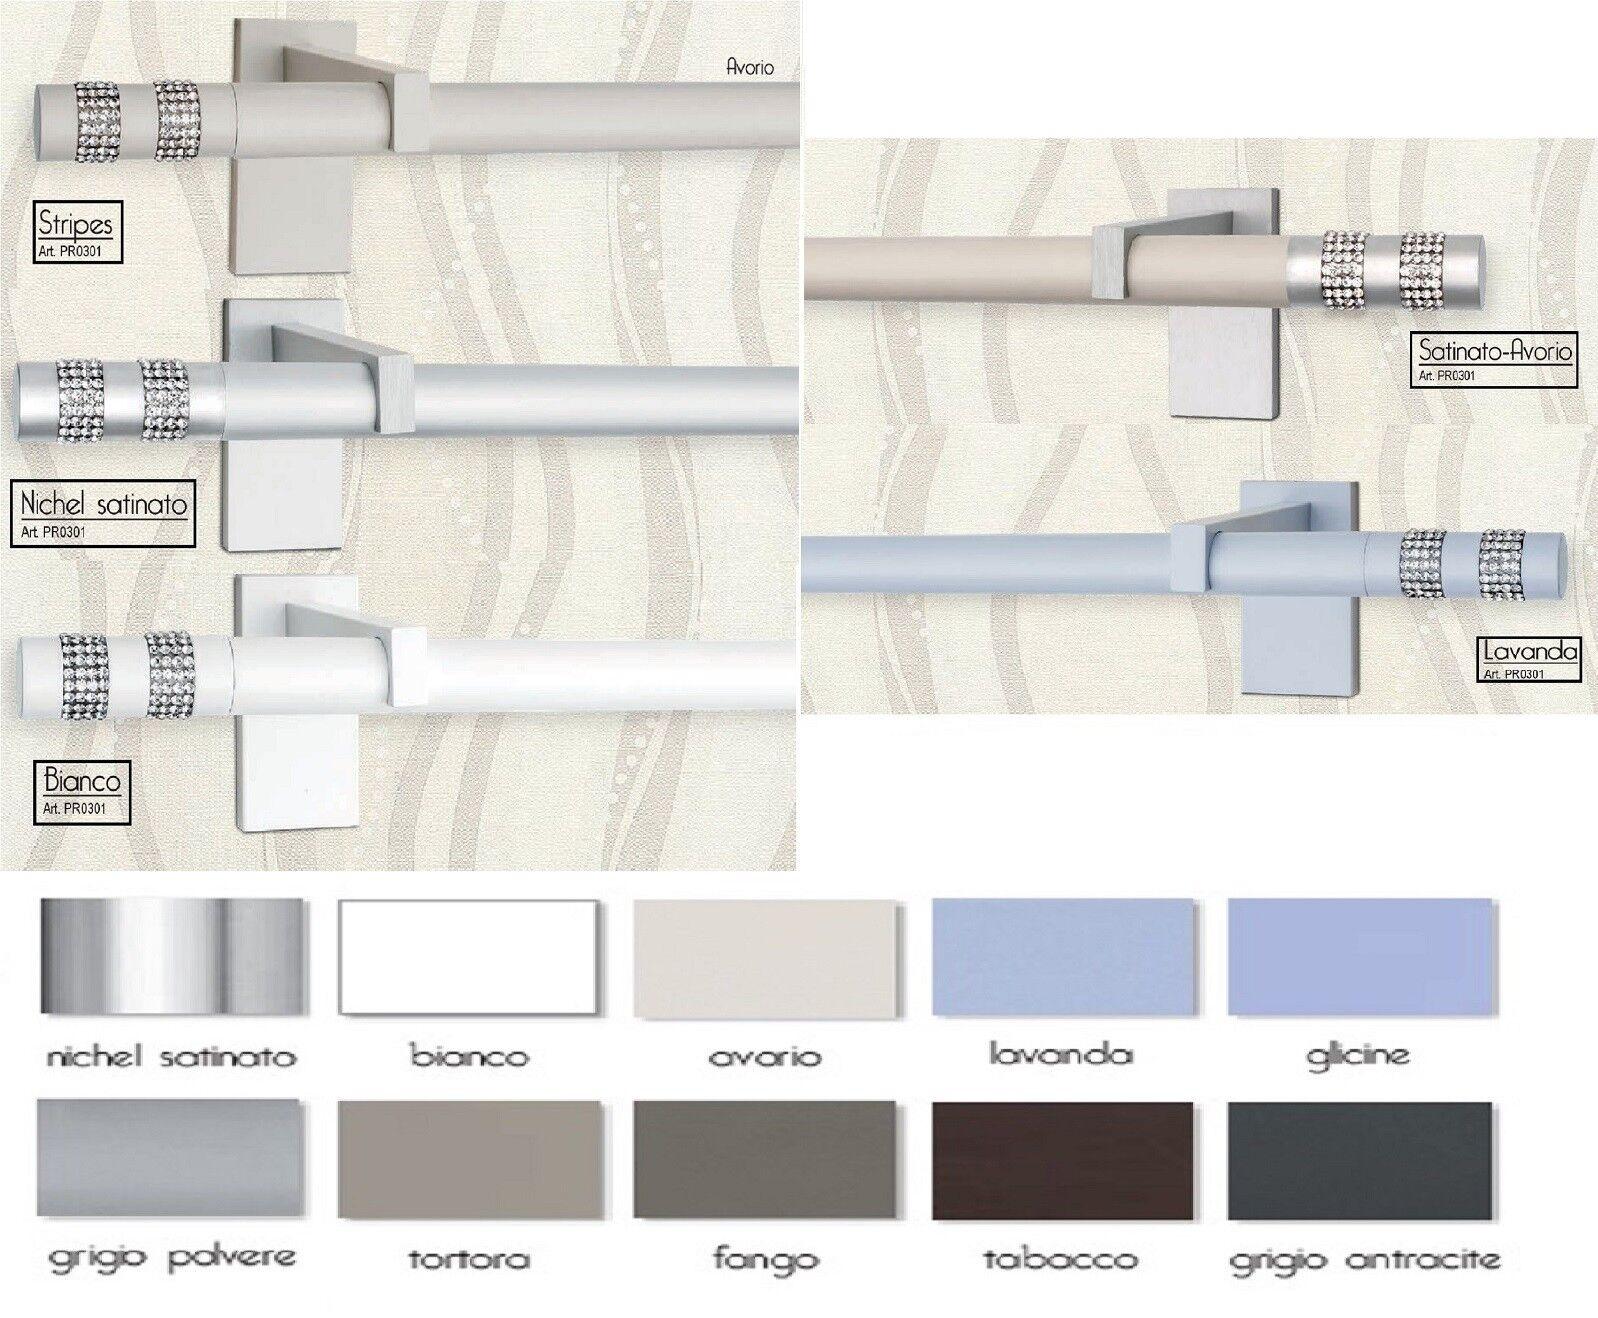 Bastone moderno in nichel Ø 20 mm per Tenda. LINEA ORION - STRIPES 160 a 360 cm